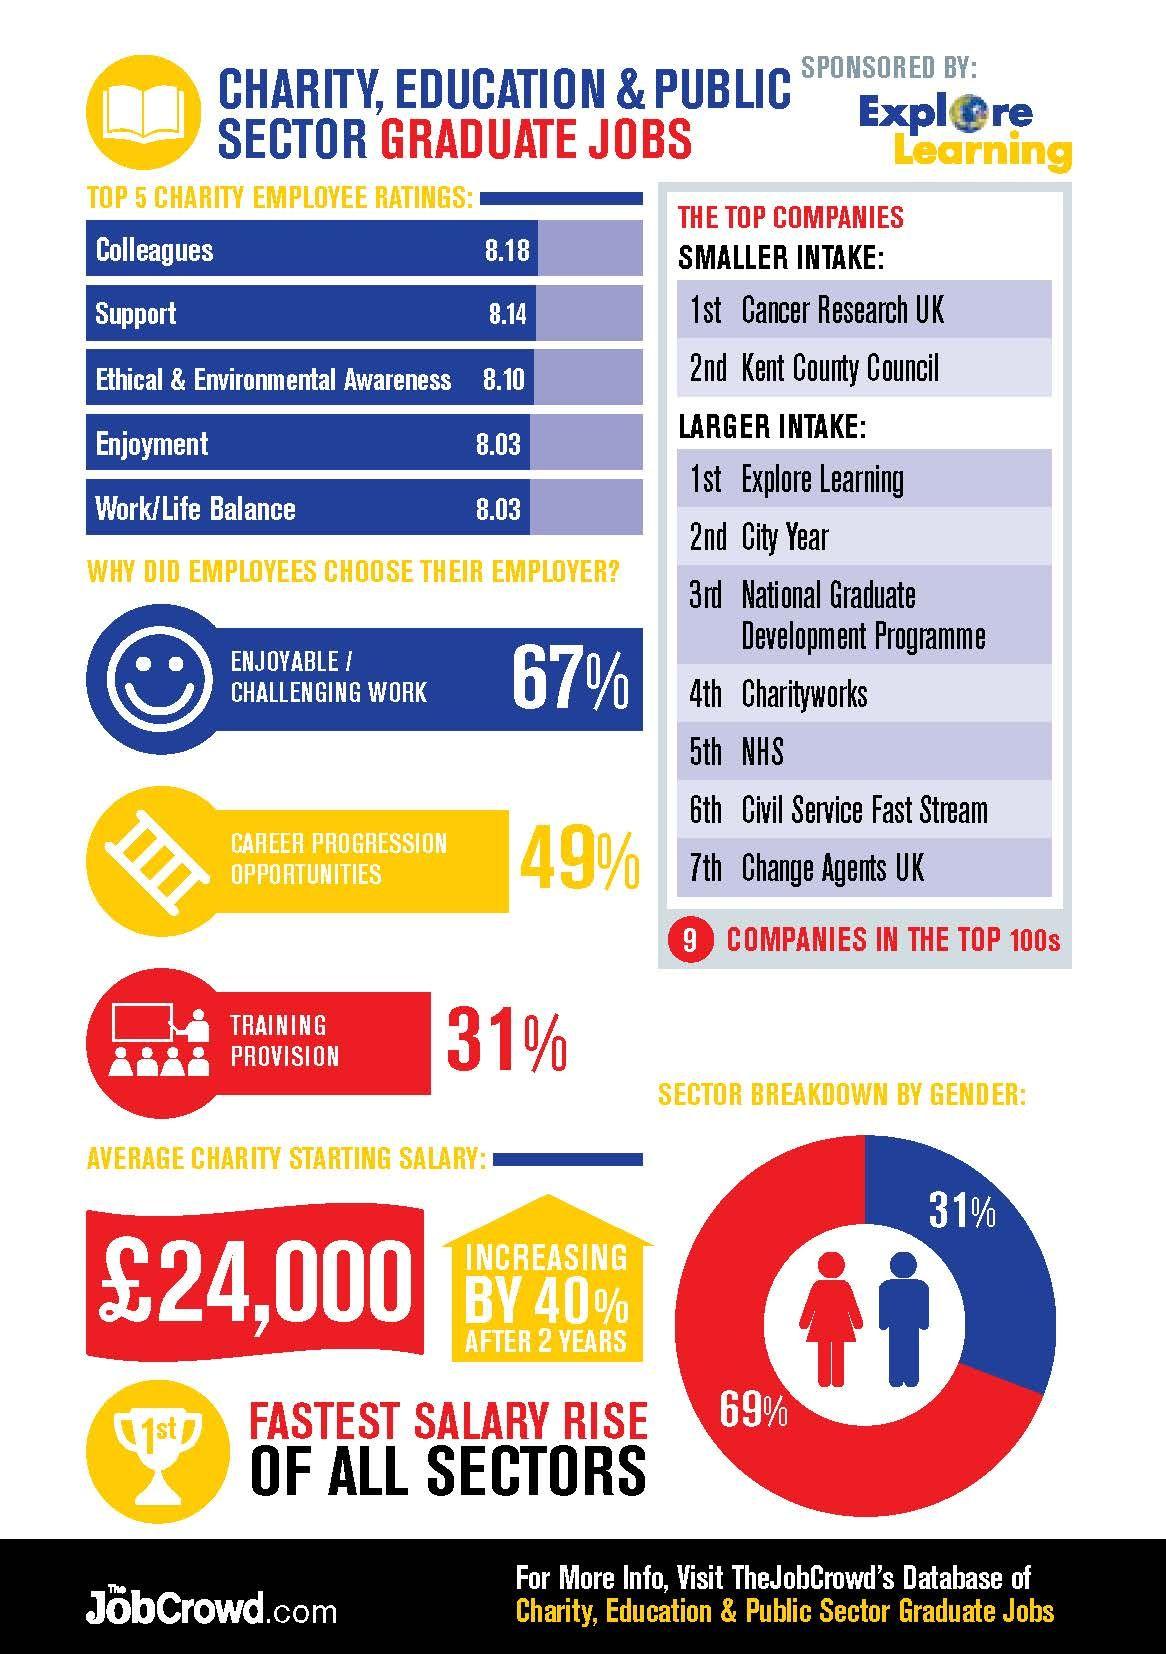 Charity, Education & Public Sector Graduate Jobs